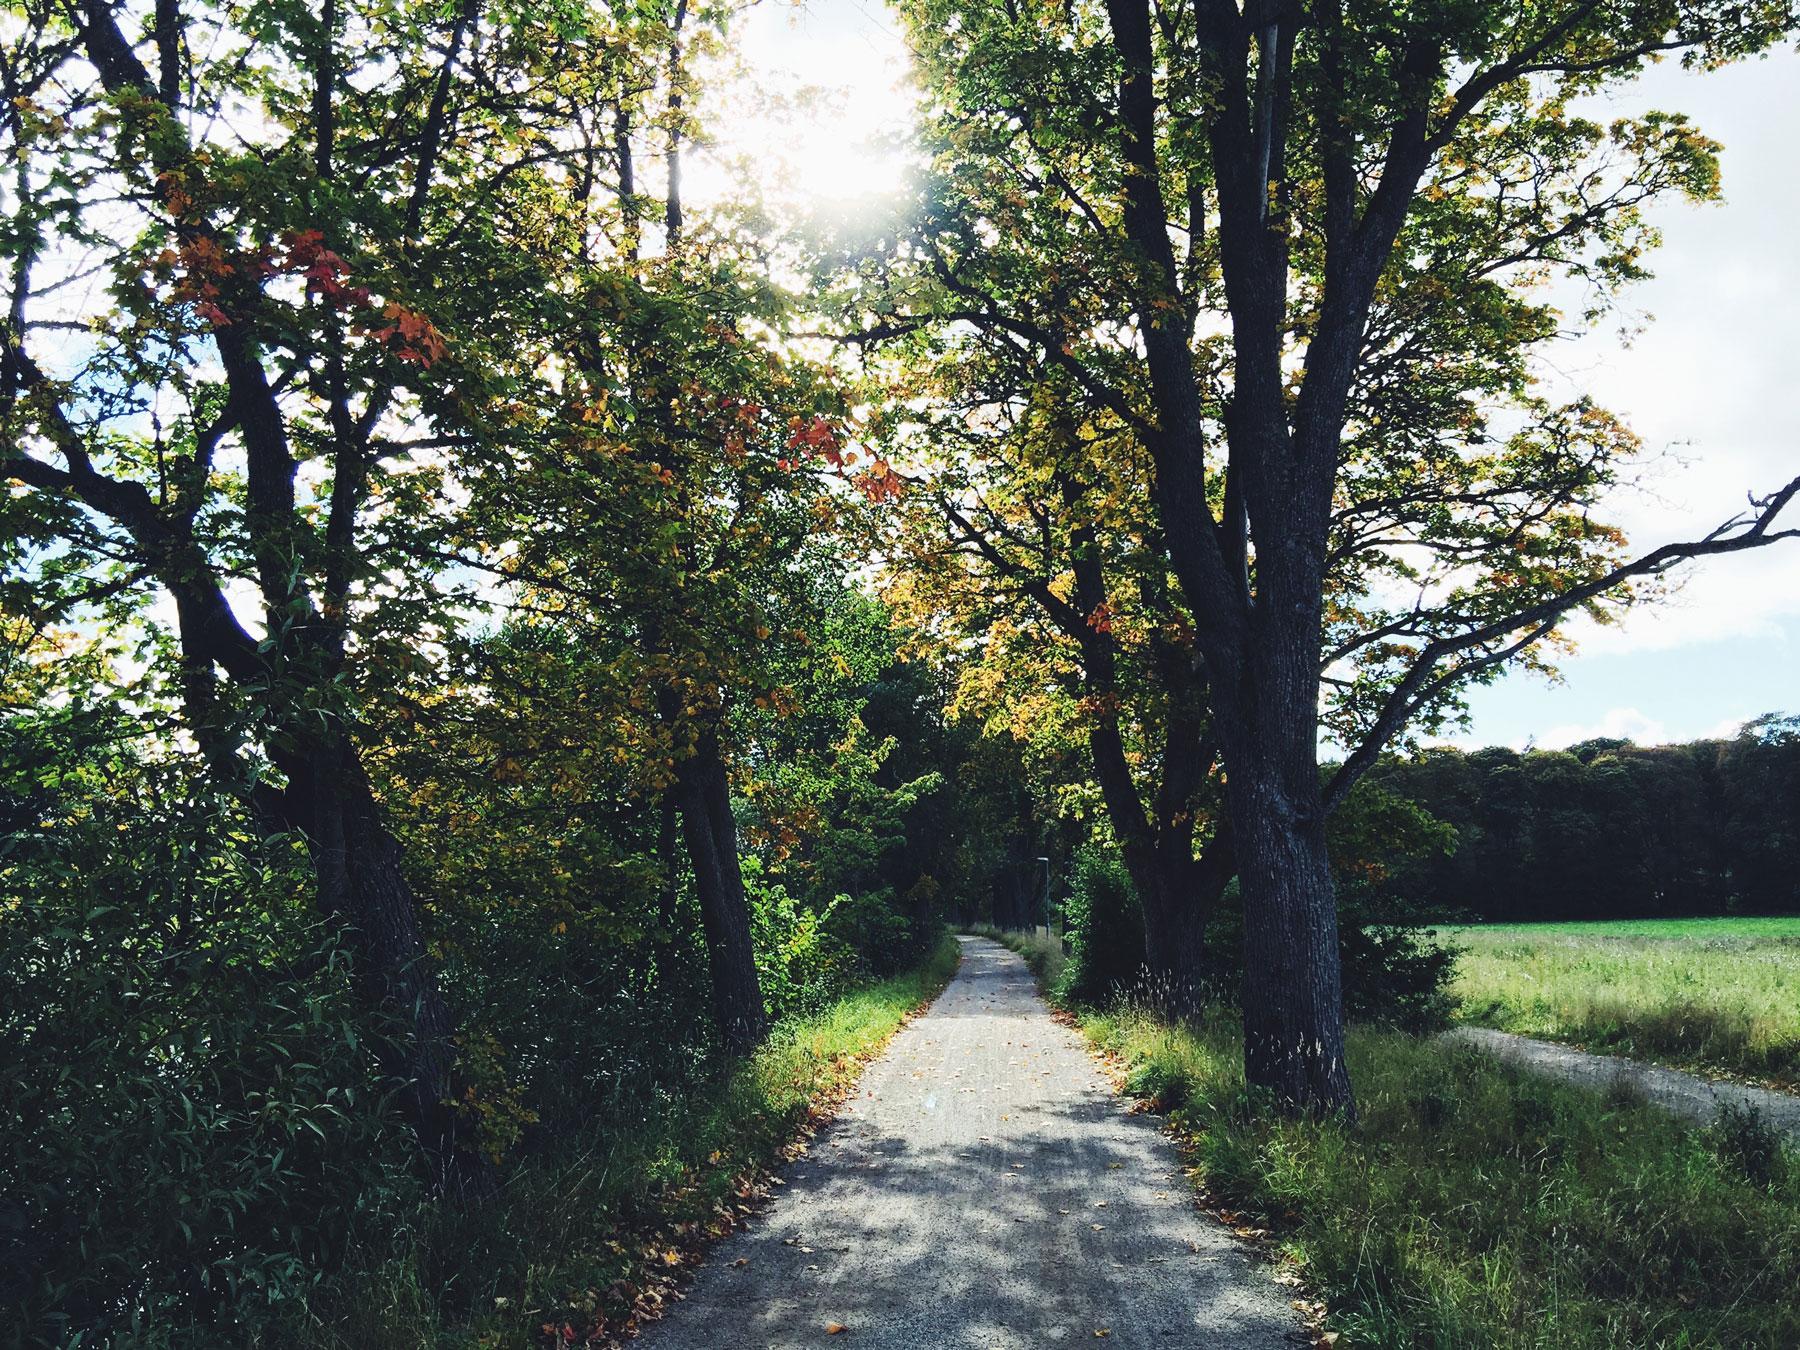 bike-trail-sunshine-autumn